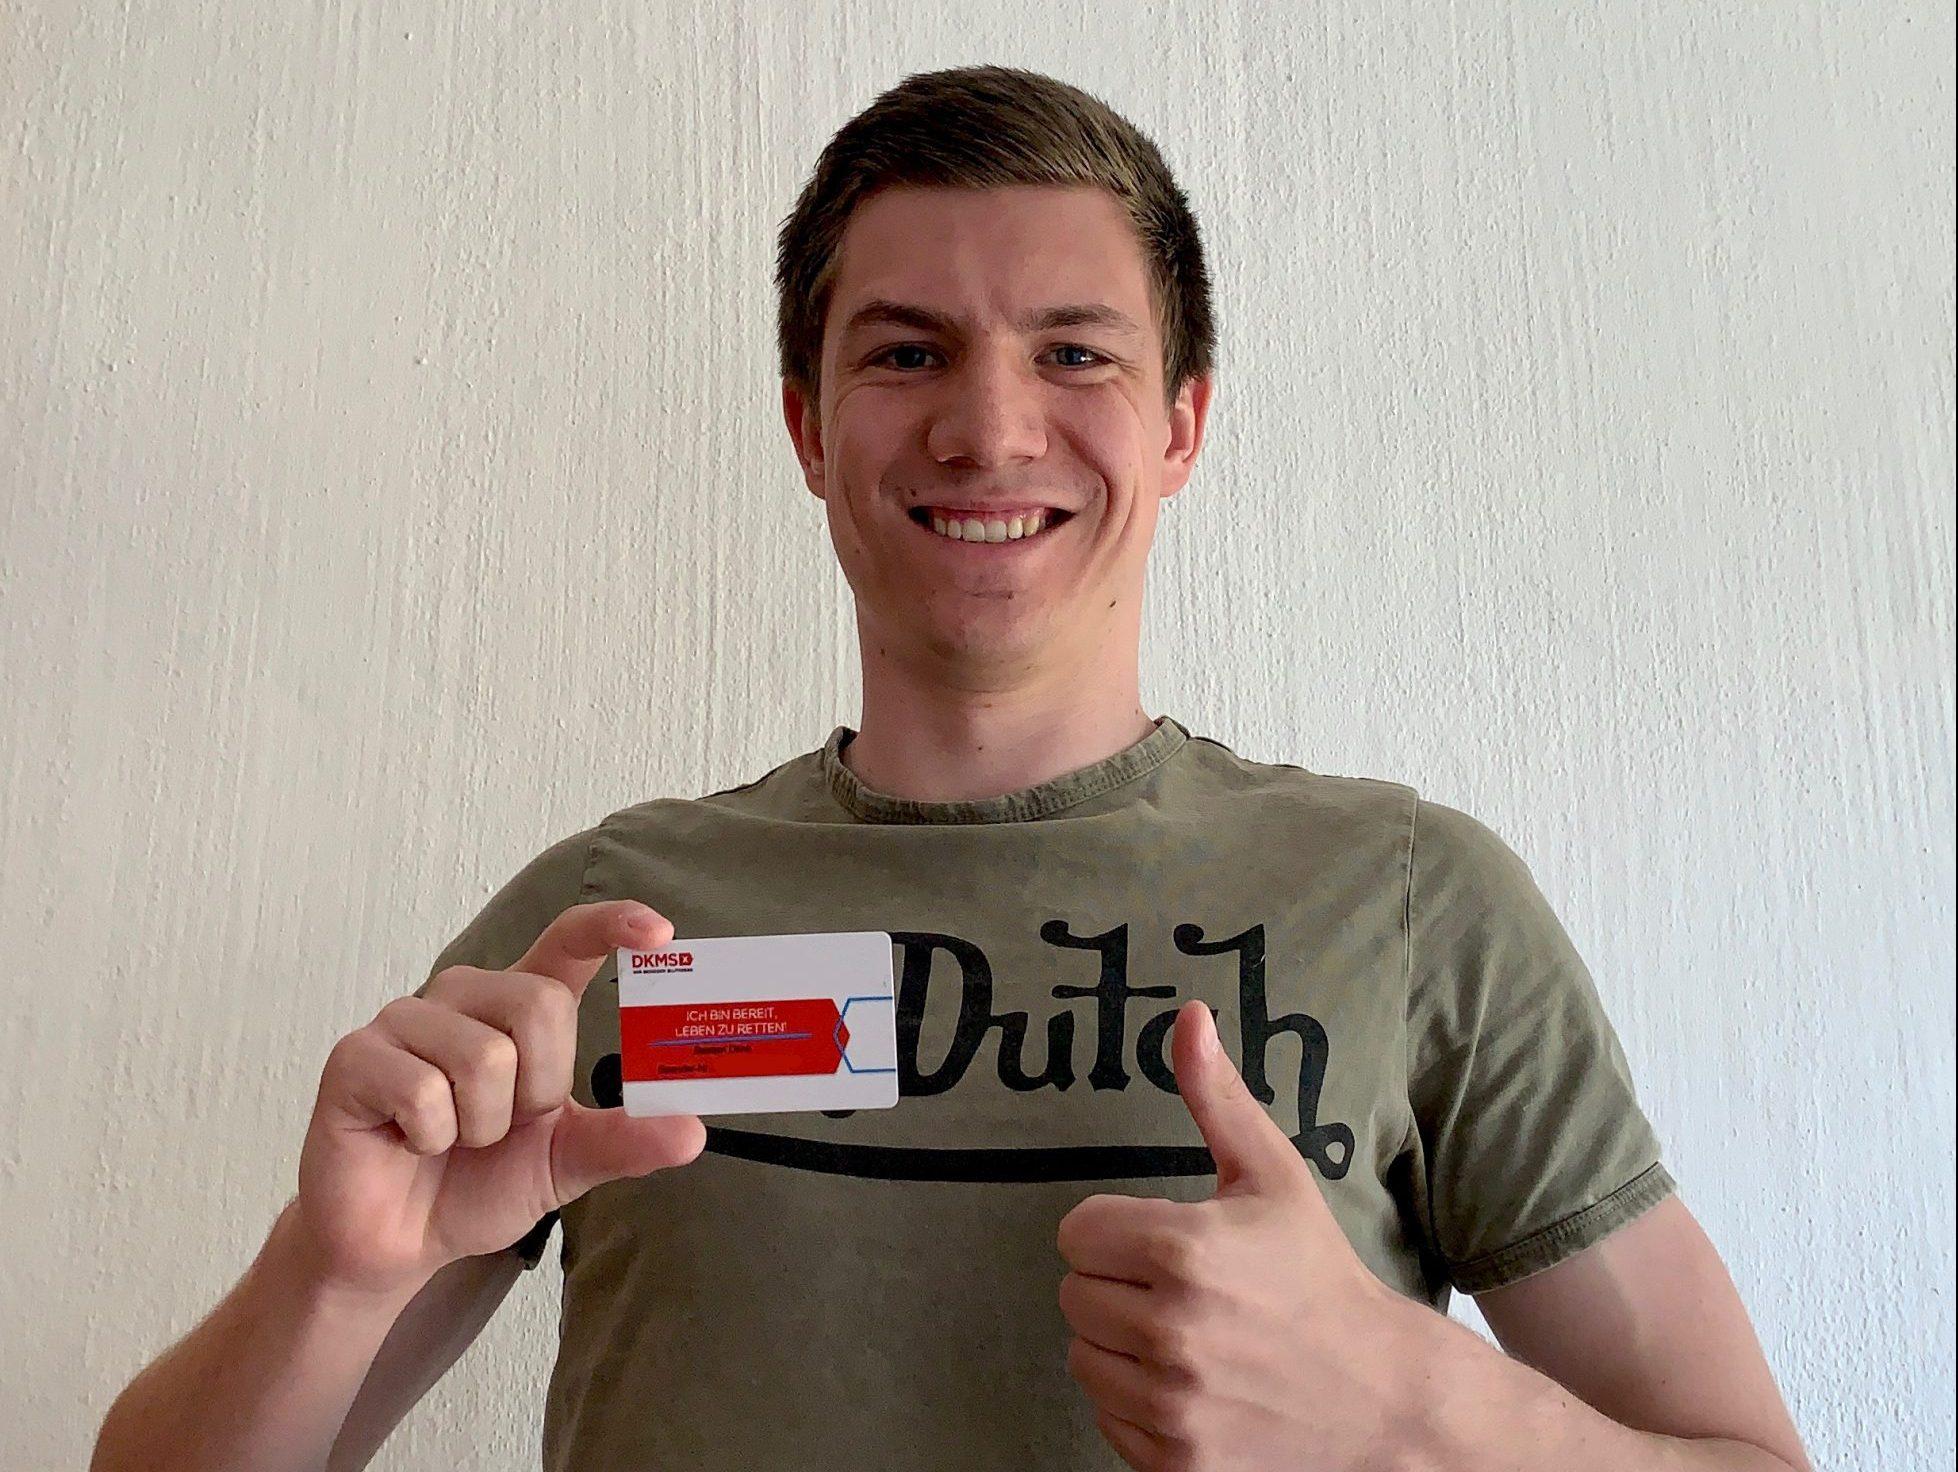 Bastian Denk